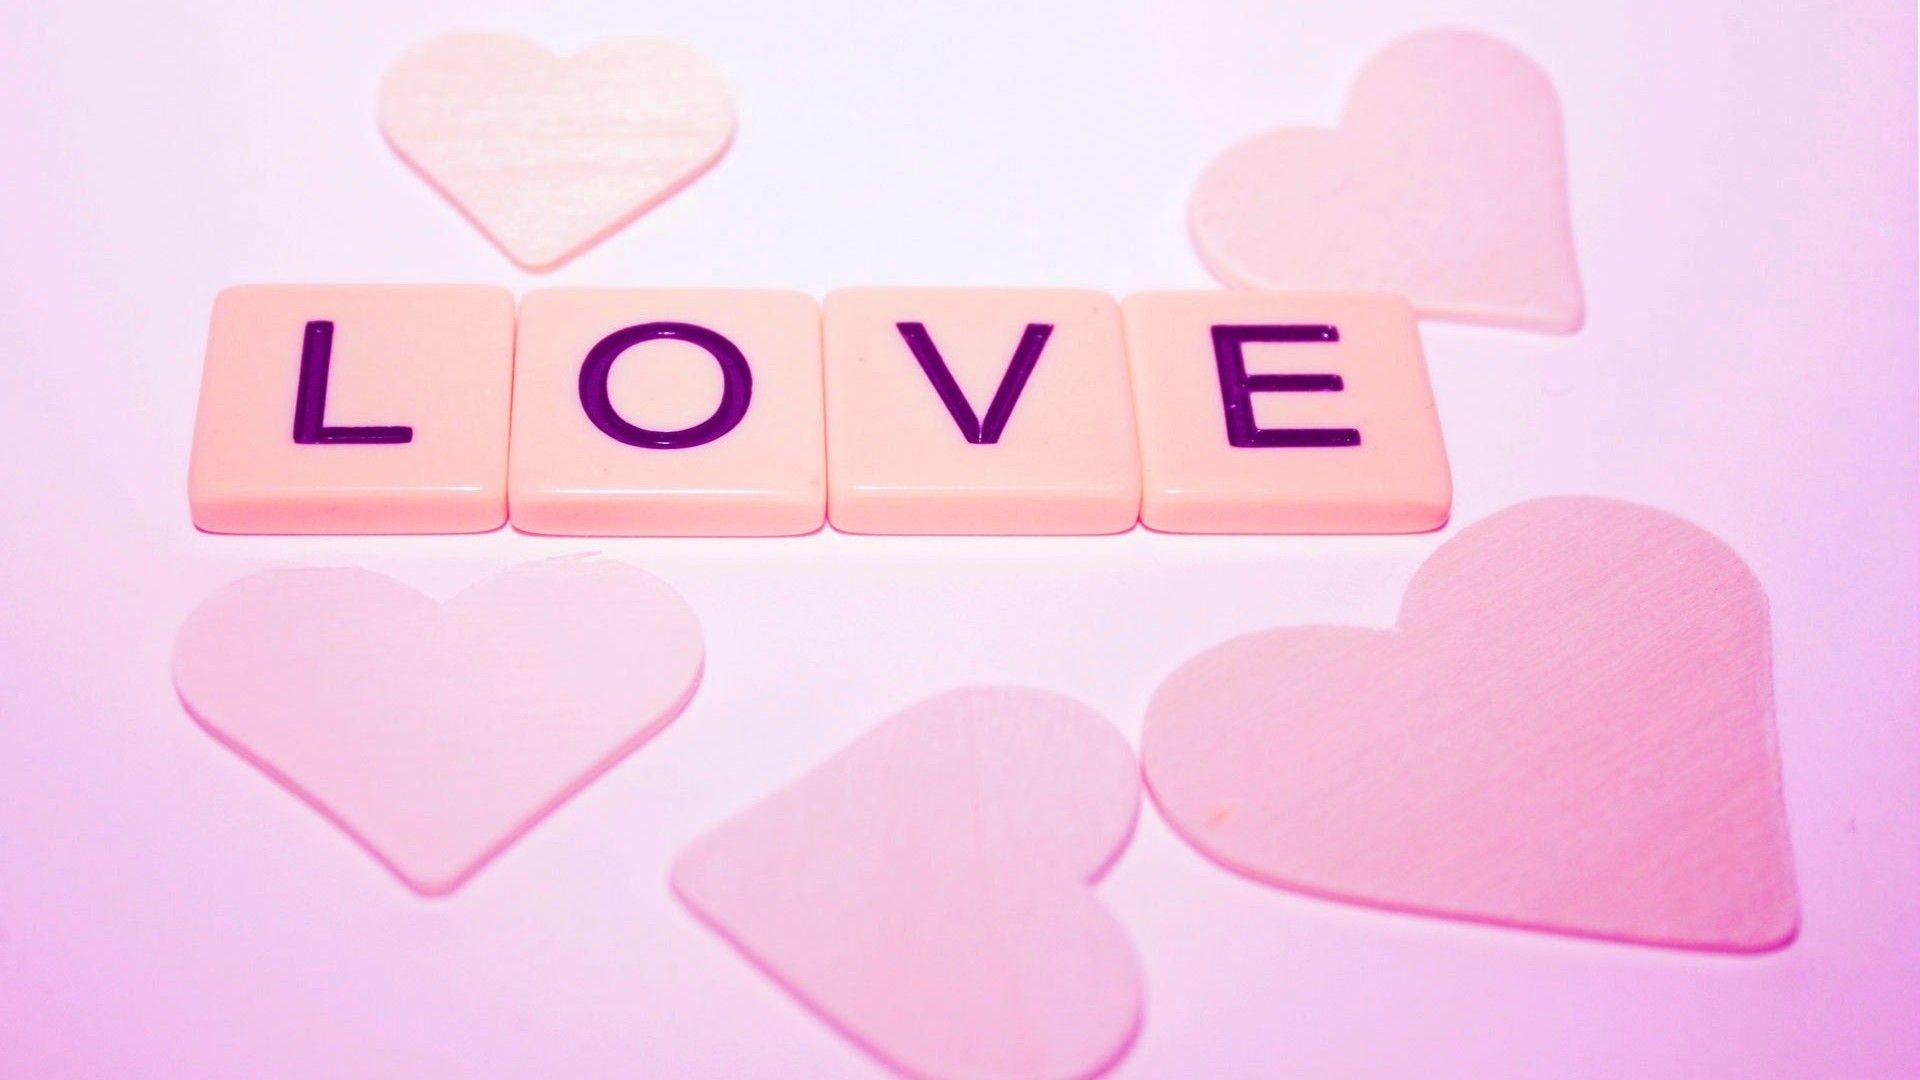 Cute Love Wallpaper Full HD Download Desktop Mobile Backgrounds